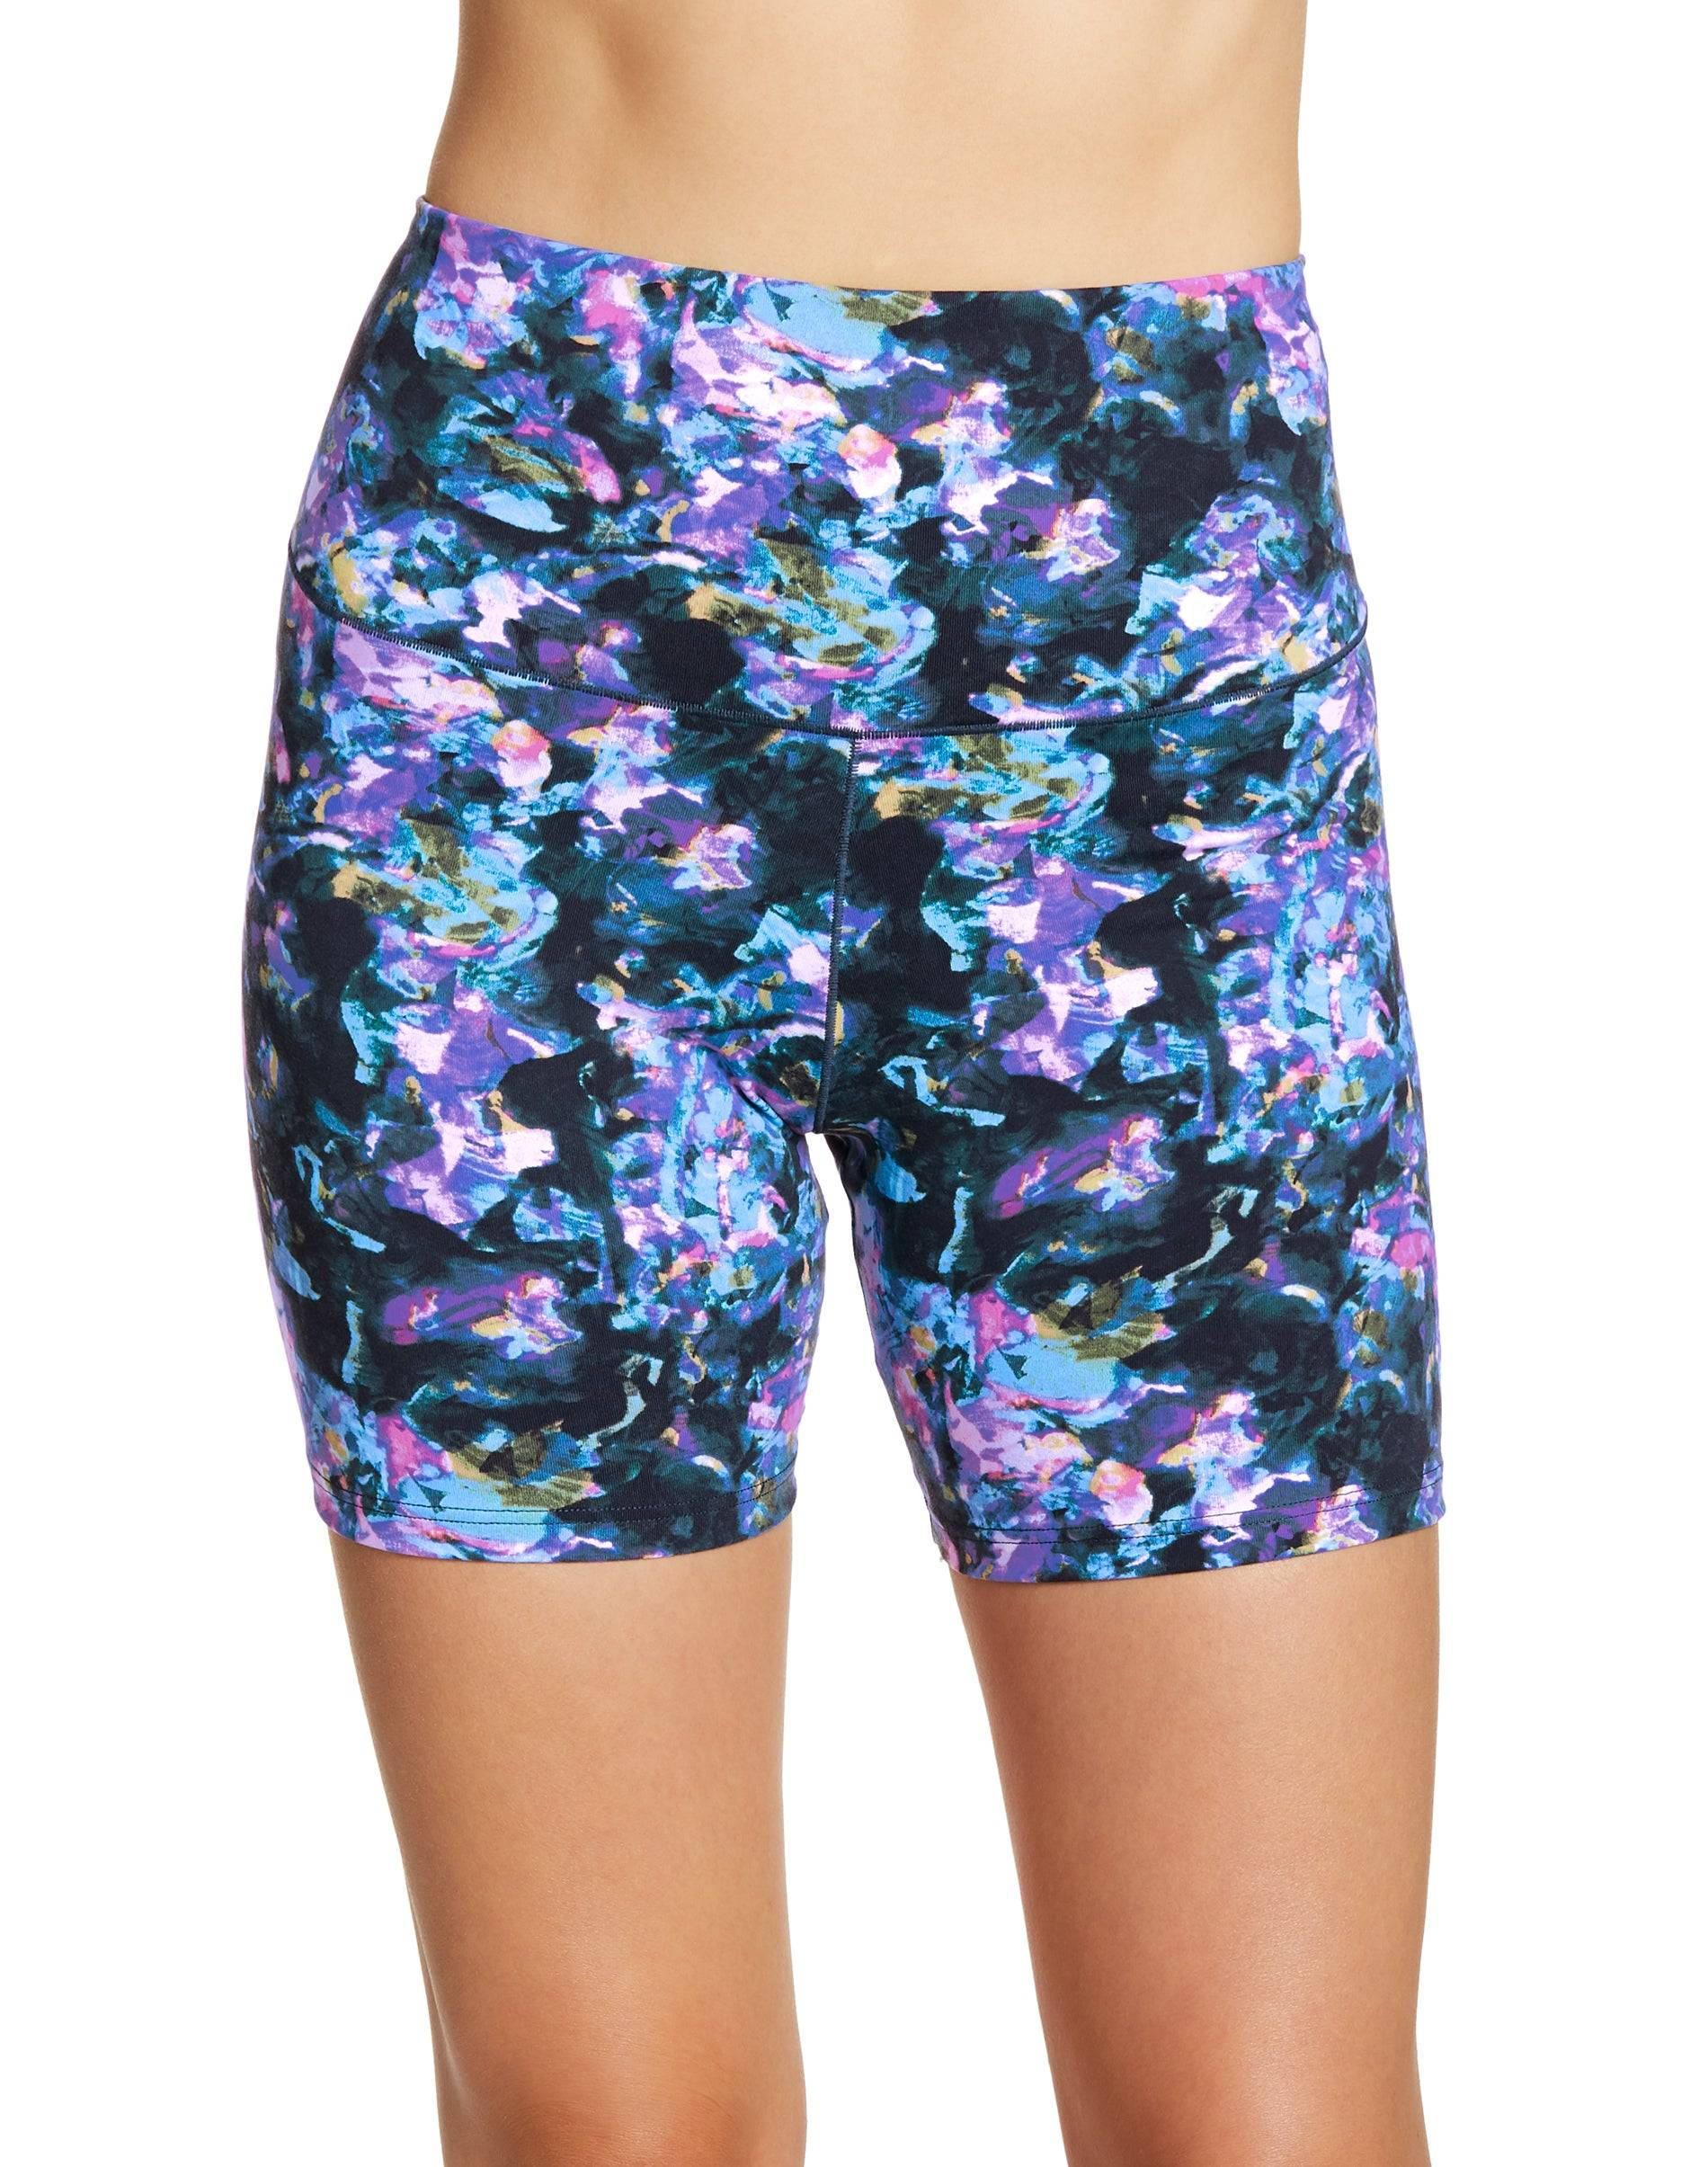 Maidenform Women's Cool Comfort Bike Short Soft Energy Floral Print/Multi S